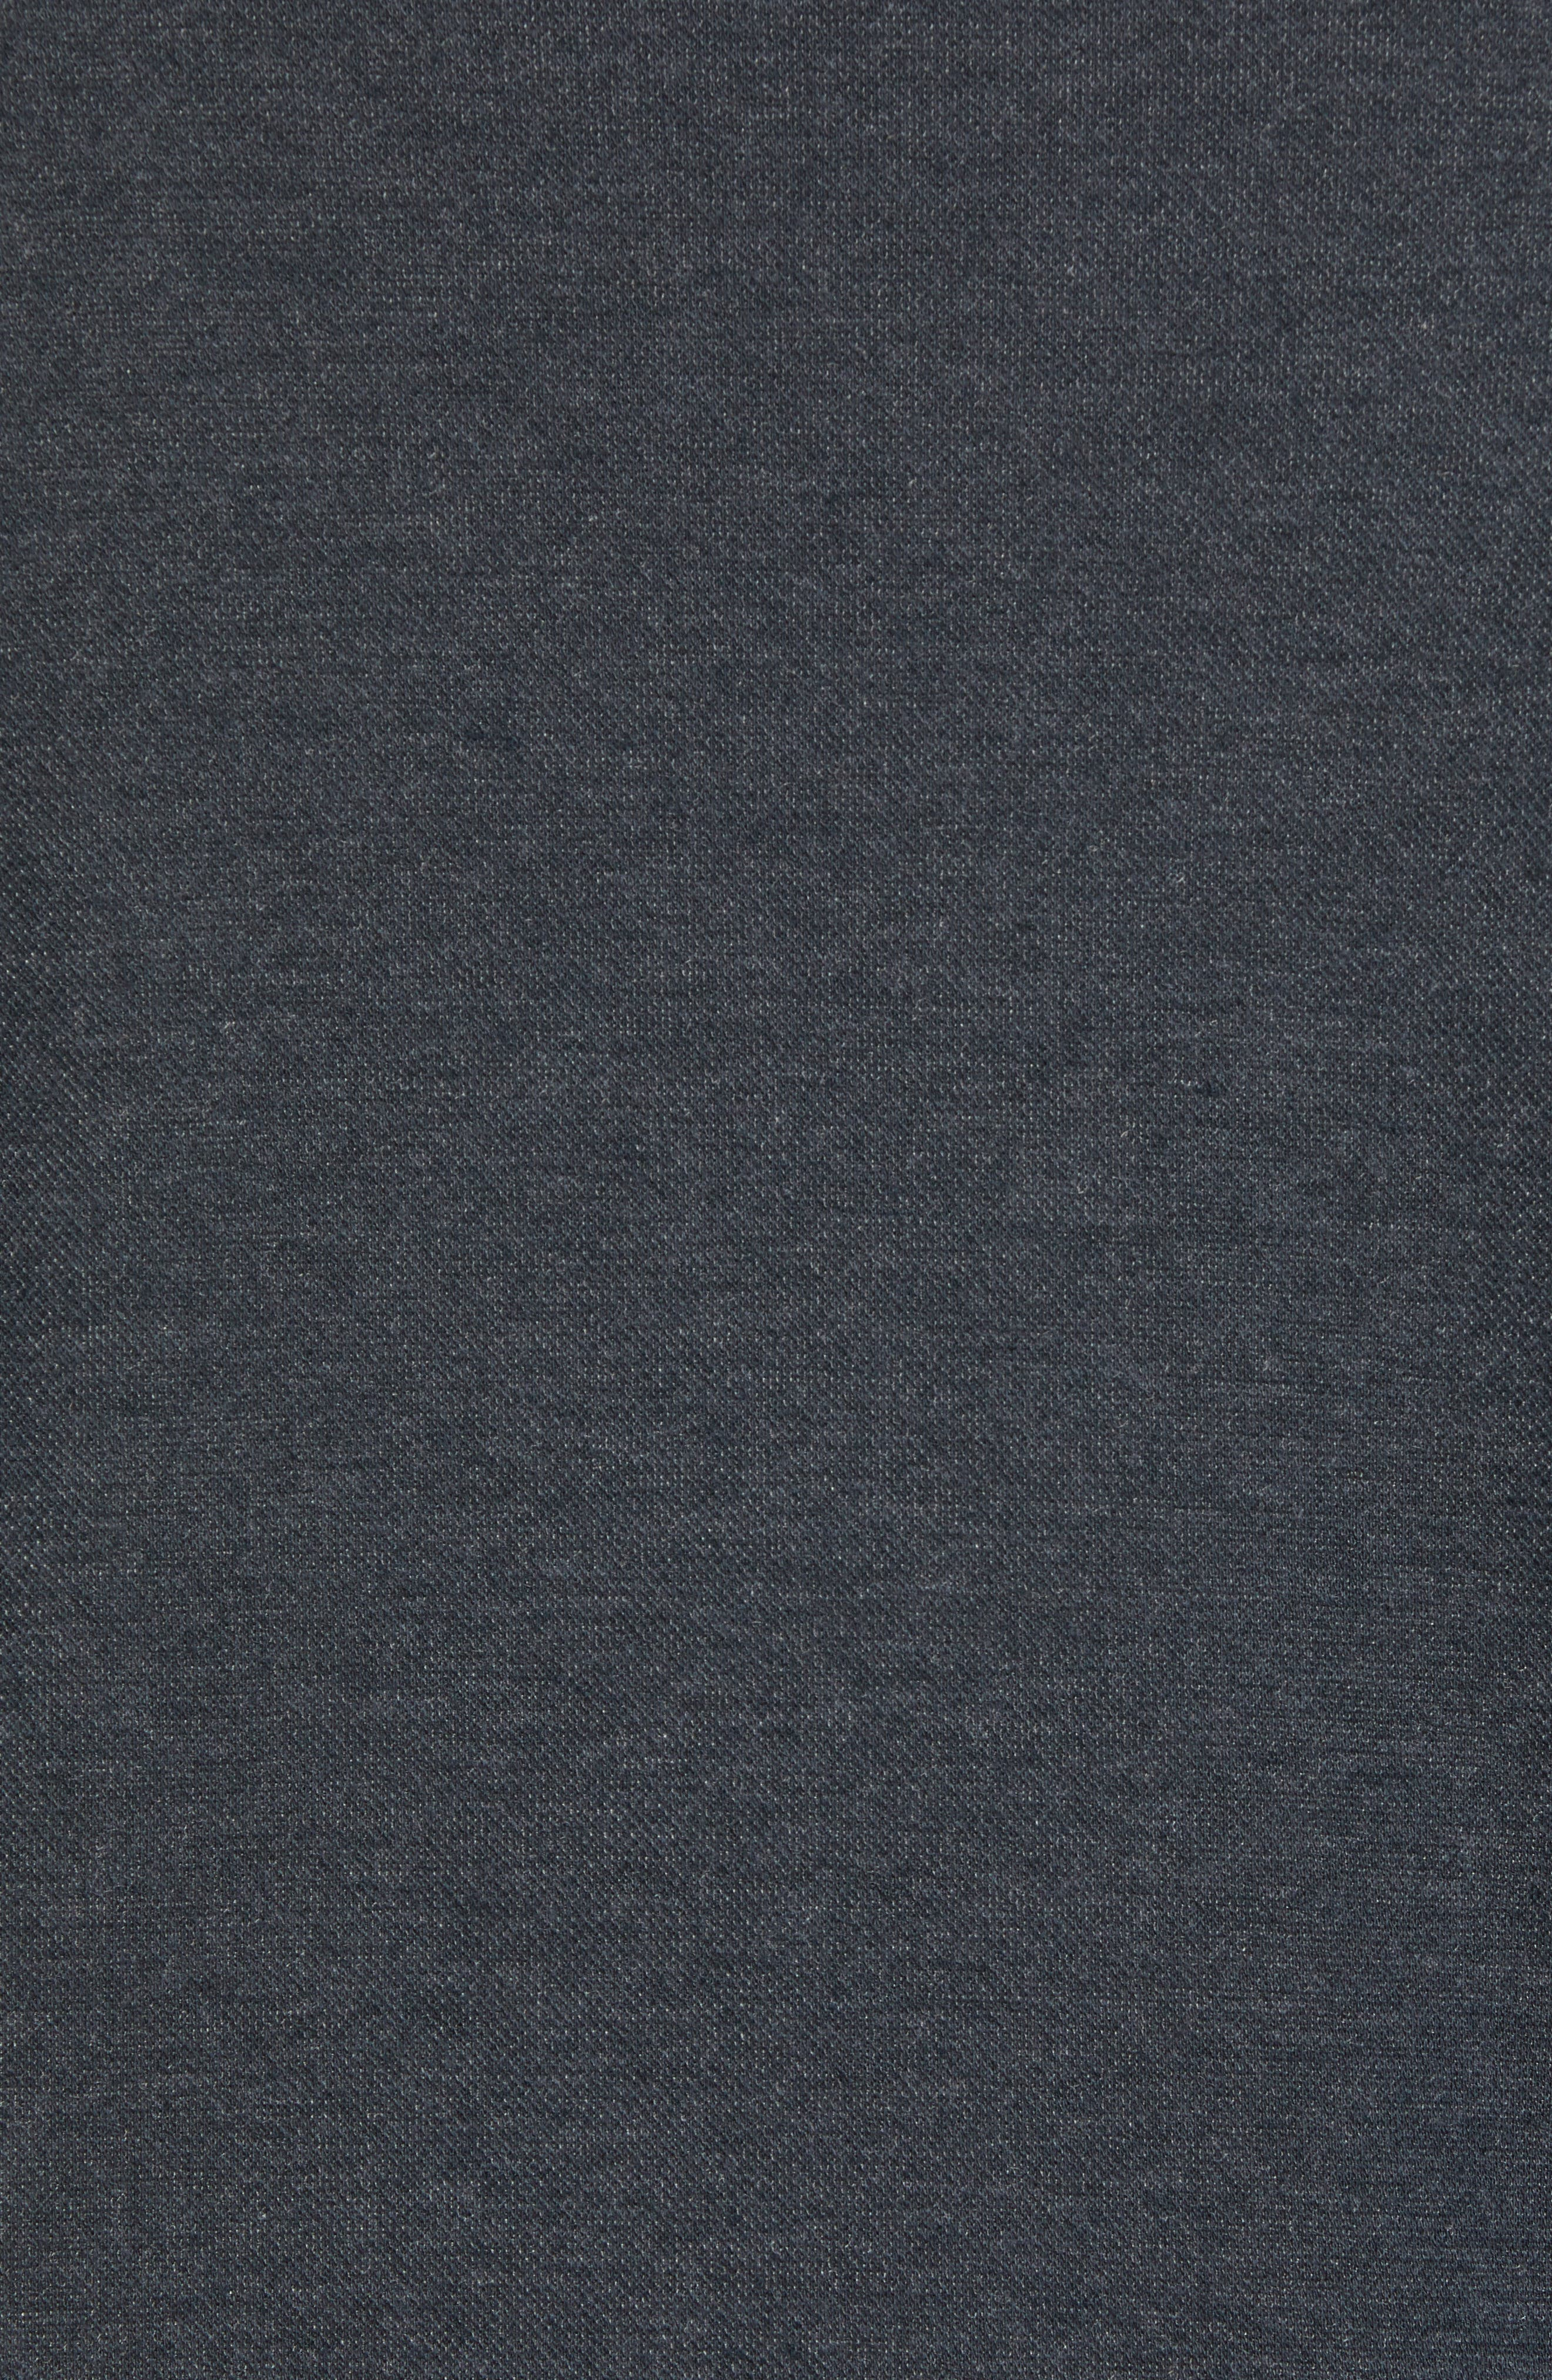 Sandbar Shawl Collar Regular Fit Pullover,                             Alternate thumbnail 5, color,                             COAL